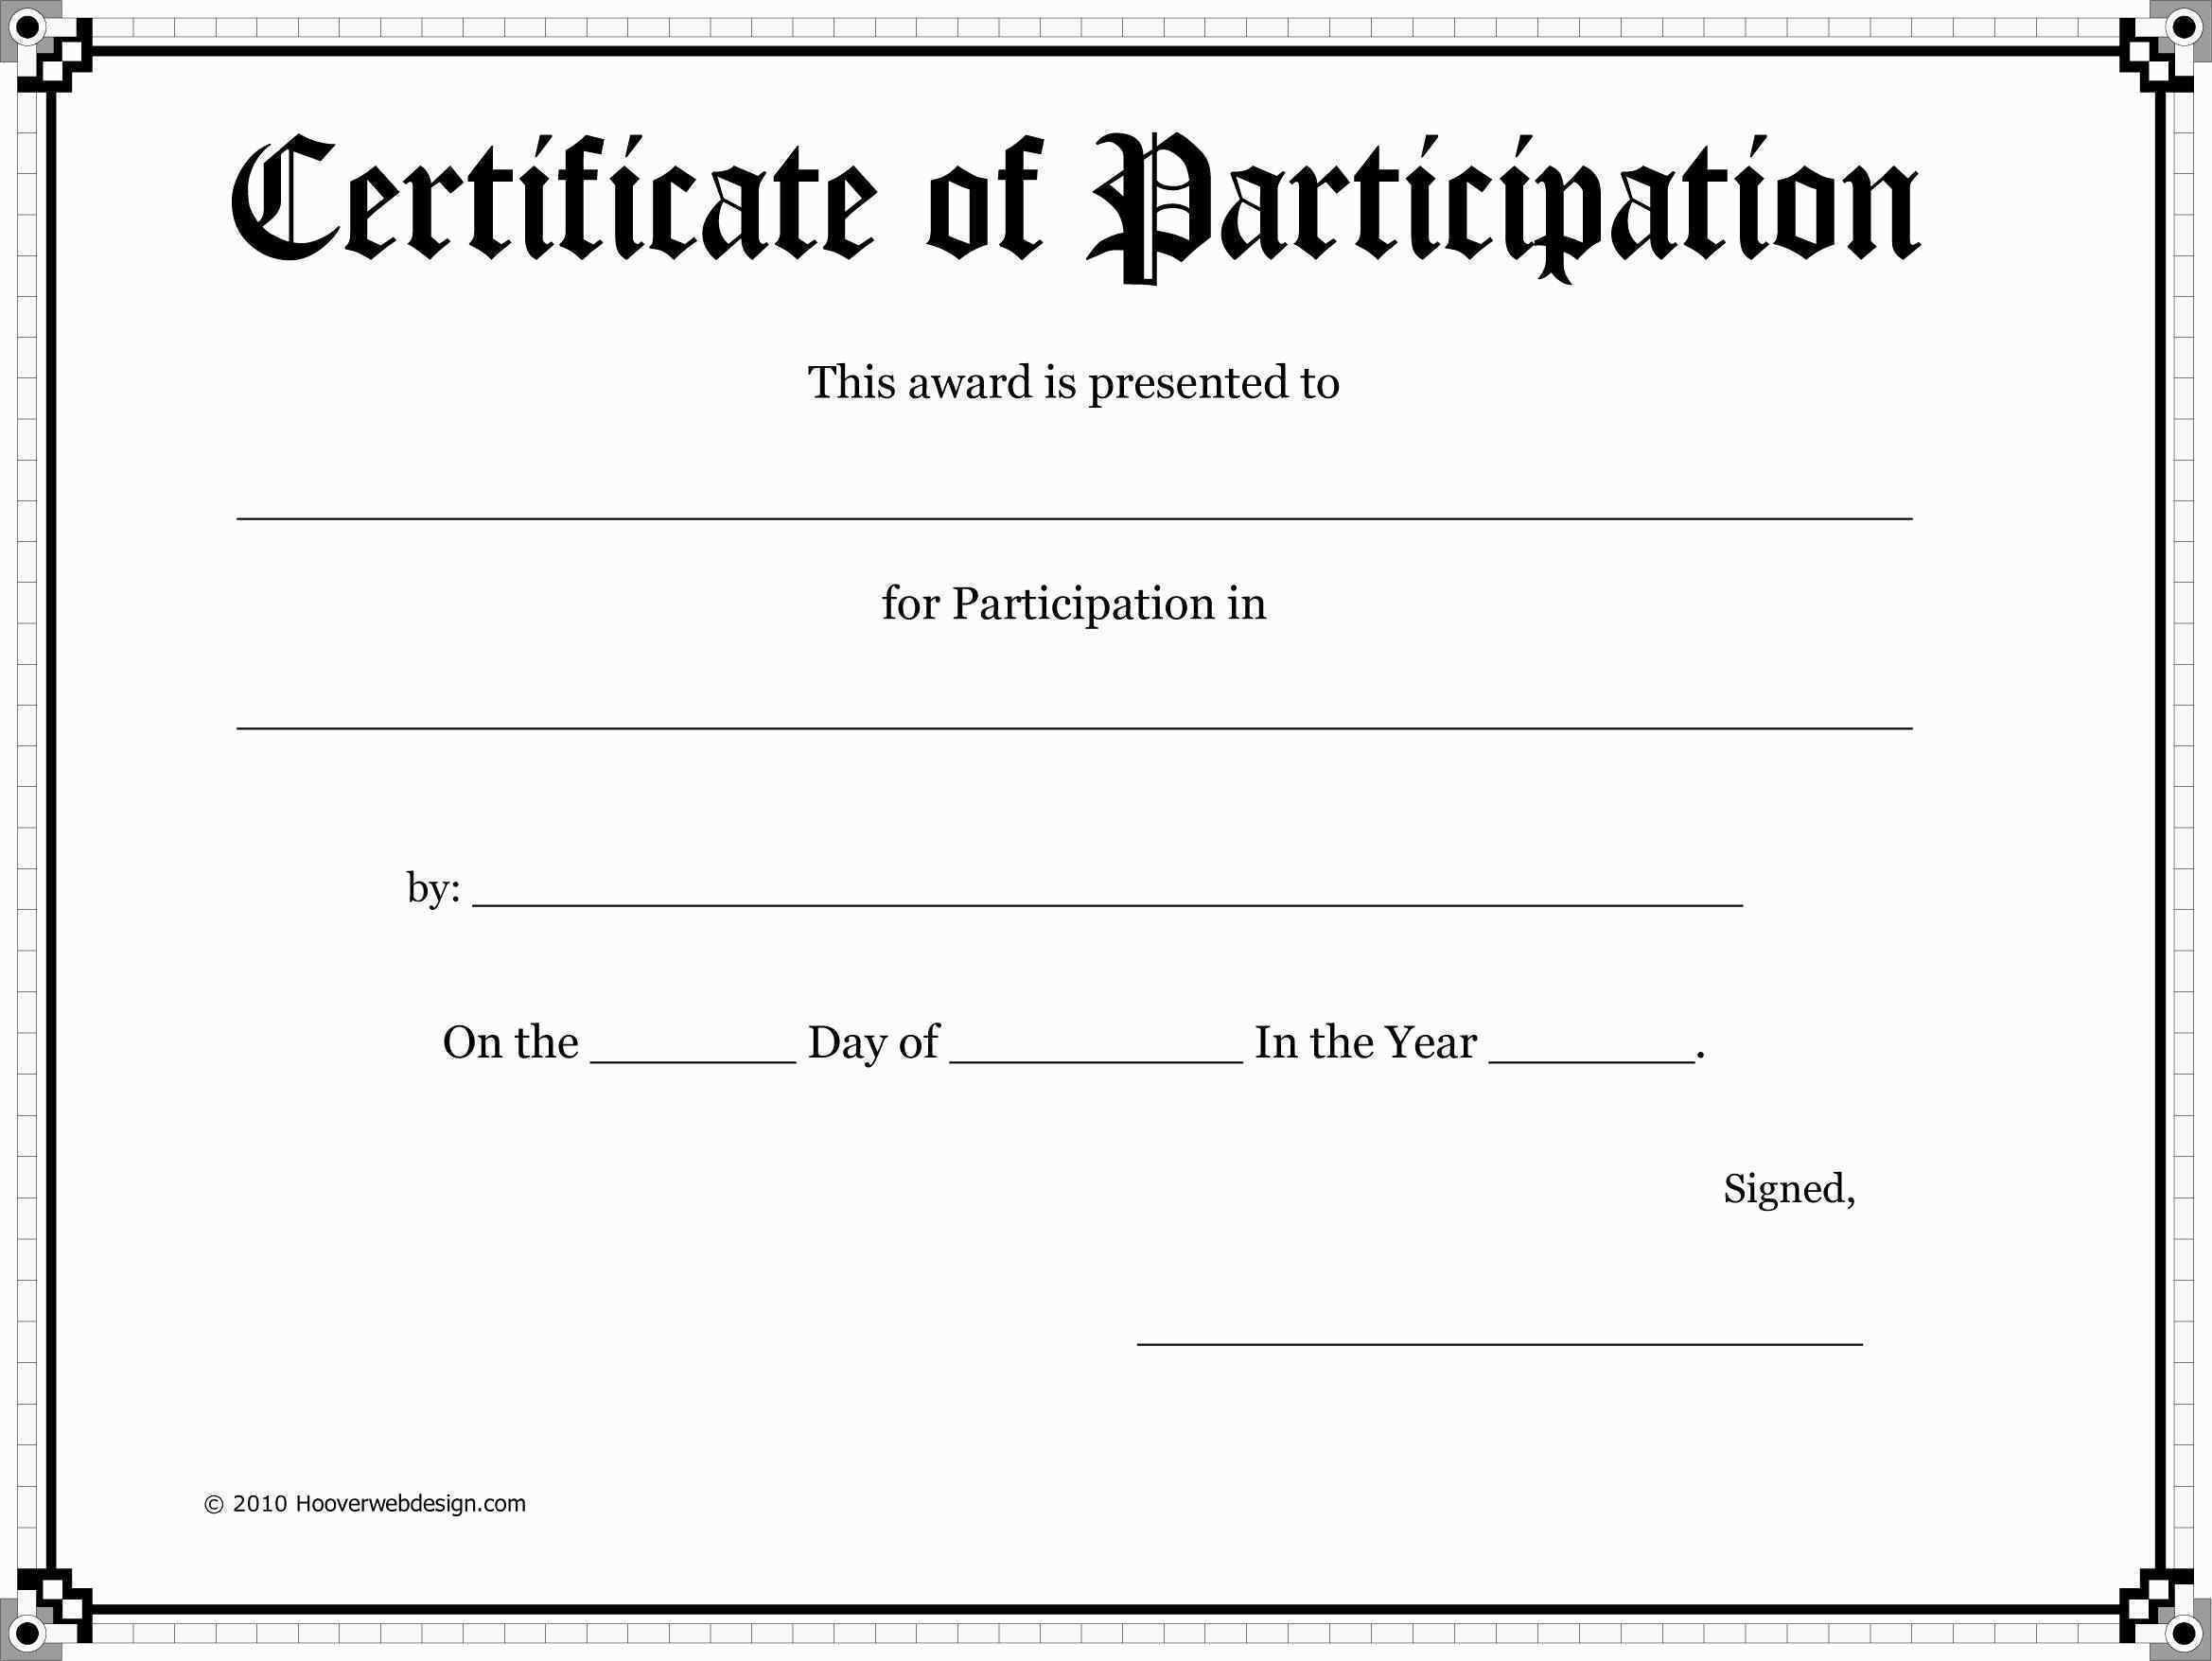 Attendance Award Certificate Templates Fresh 14 Best At Certificate Of Participation Template Free Printable Certificate Templates Awards Certificates Template